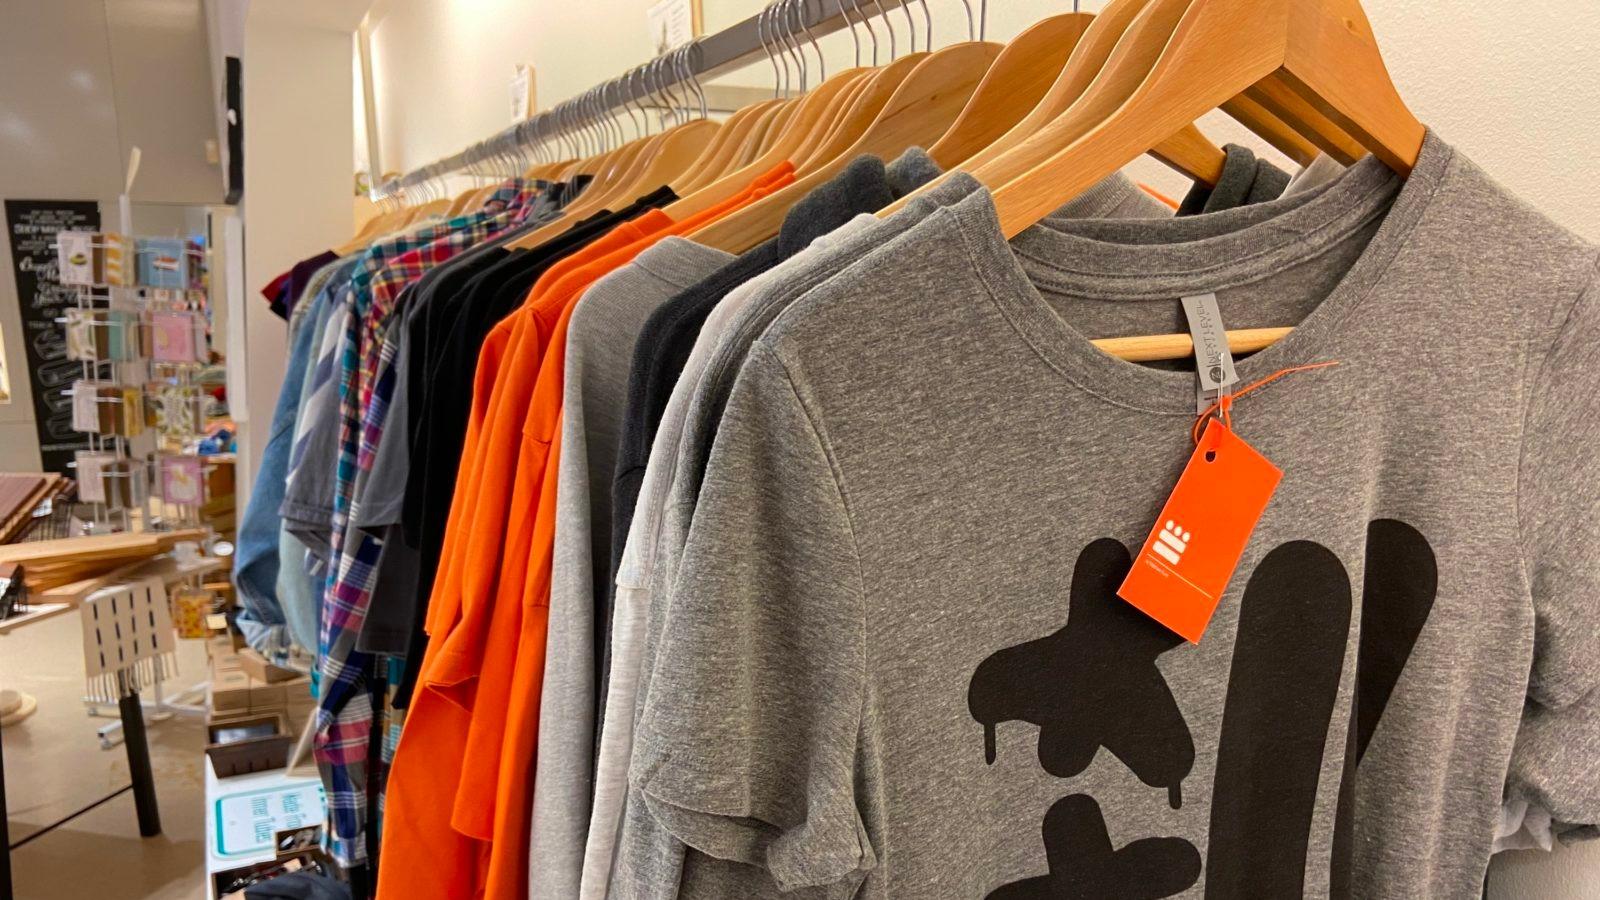 Can Washington, D.C. Become A 'Fashion City'? : NPR